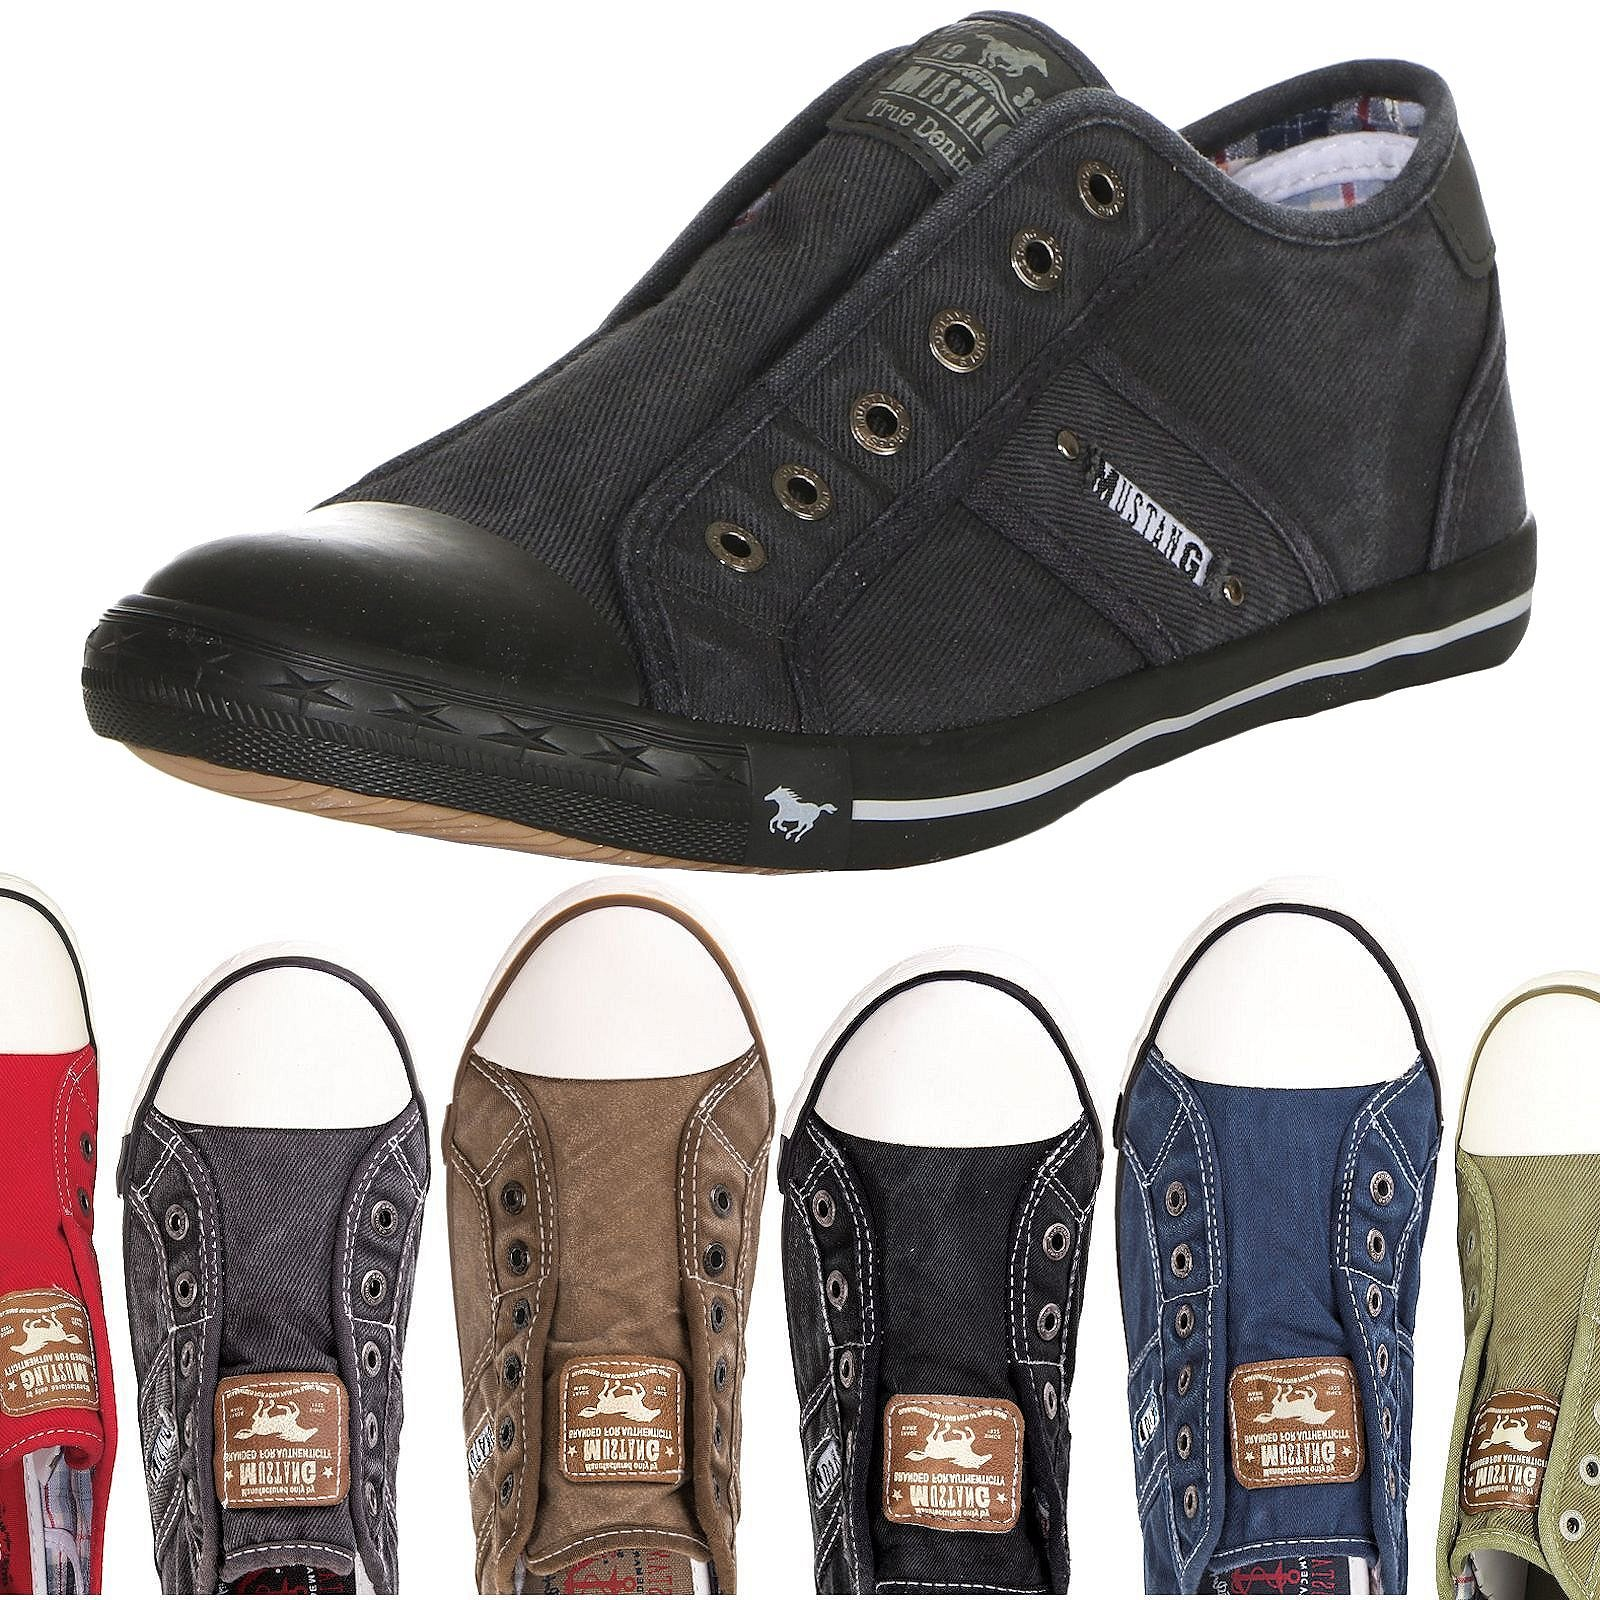 NEU Mustang Herrenschuhe Schuhe Canvas Sneaker Herrensneaker Slipper Halbschuhe